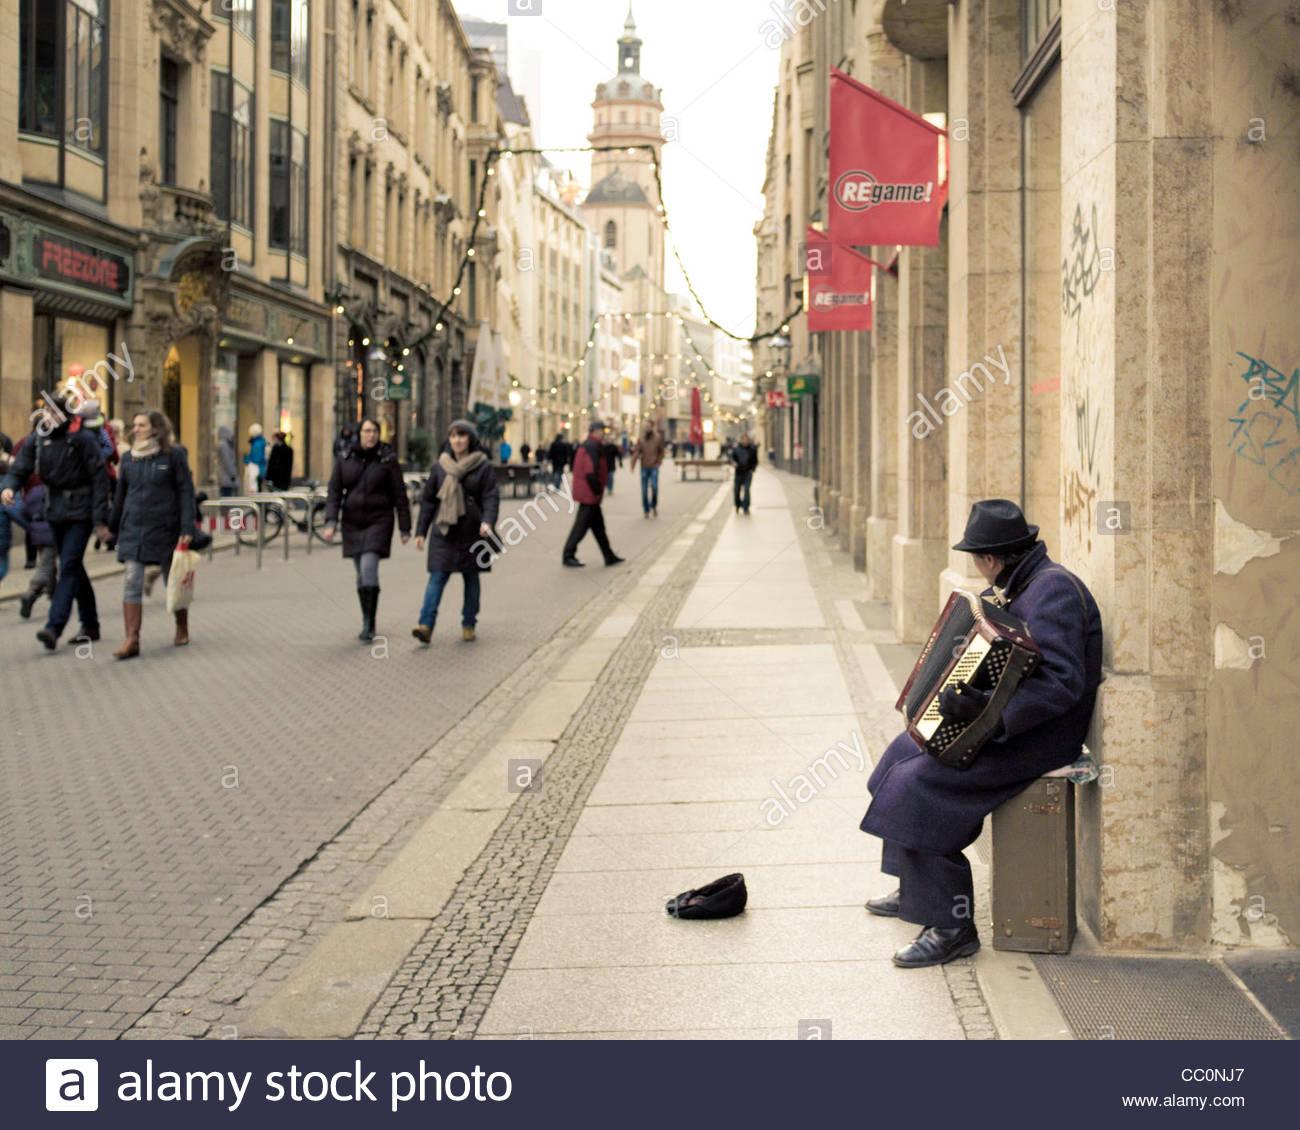 Street Musician playing an accordion, Nikolaistraße, Leipzig, Germany - Stock Image